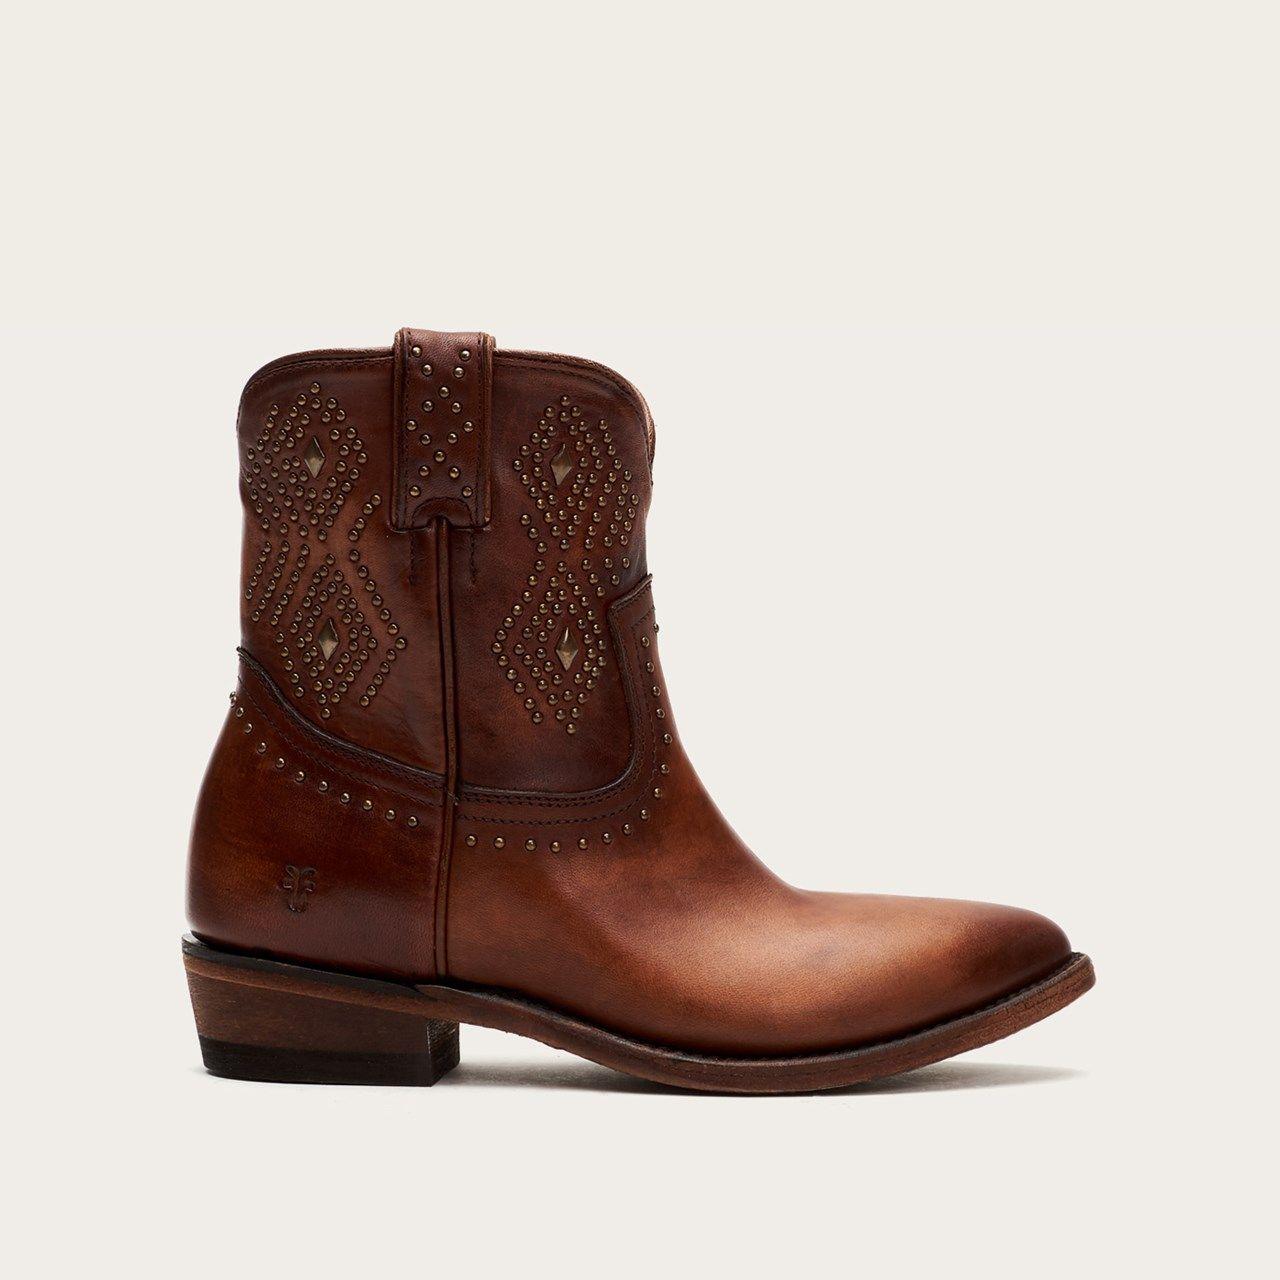 e94940af189 Billy Stud Short Boots | FRYE Since 1863 in 2019 | Christmas List ...